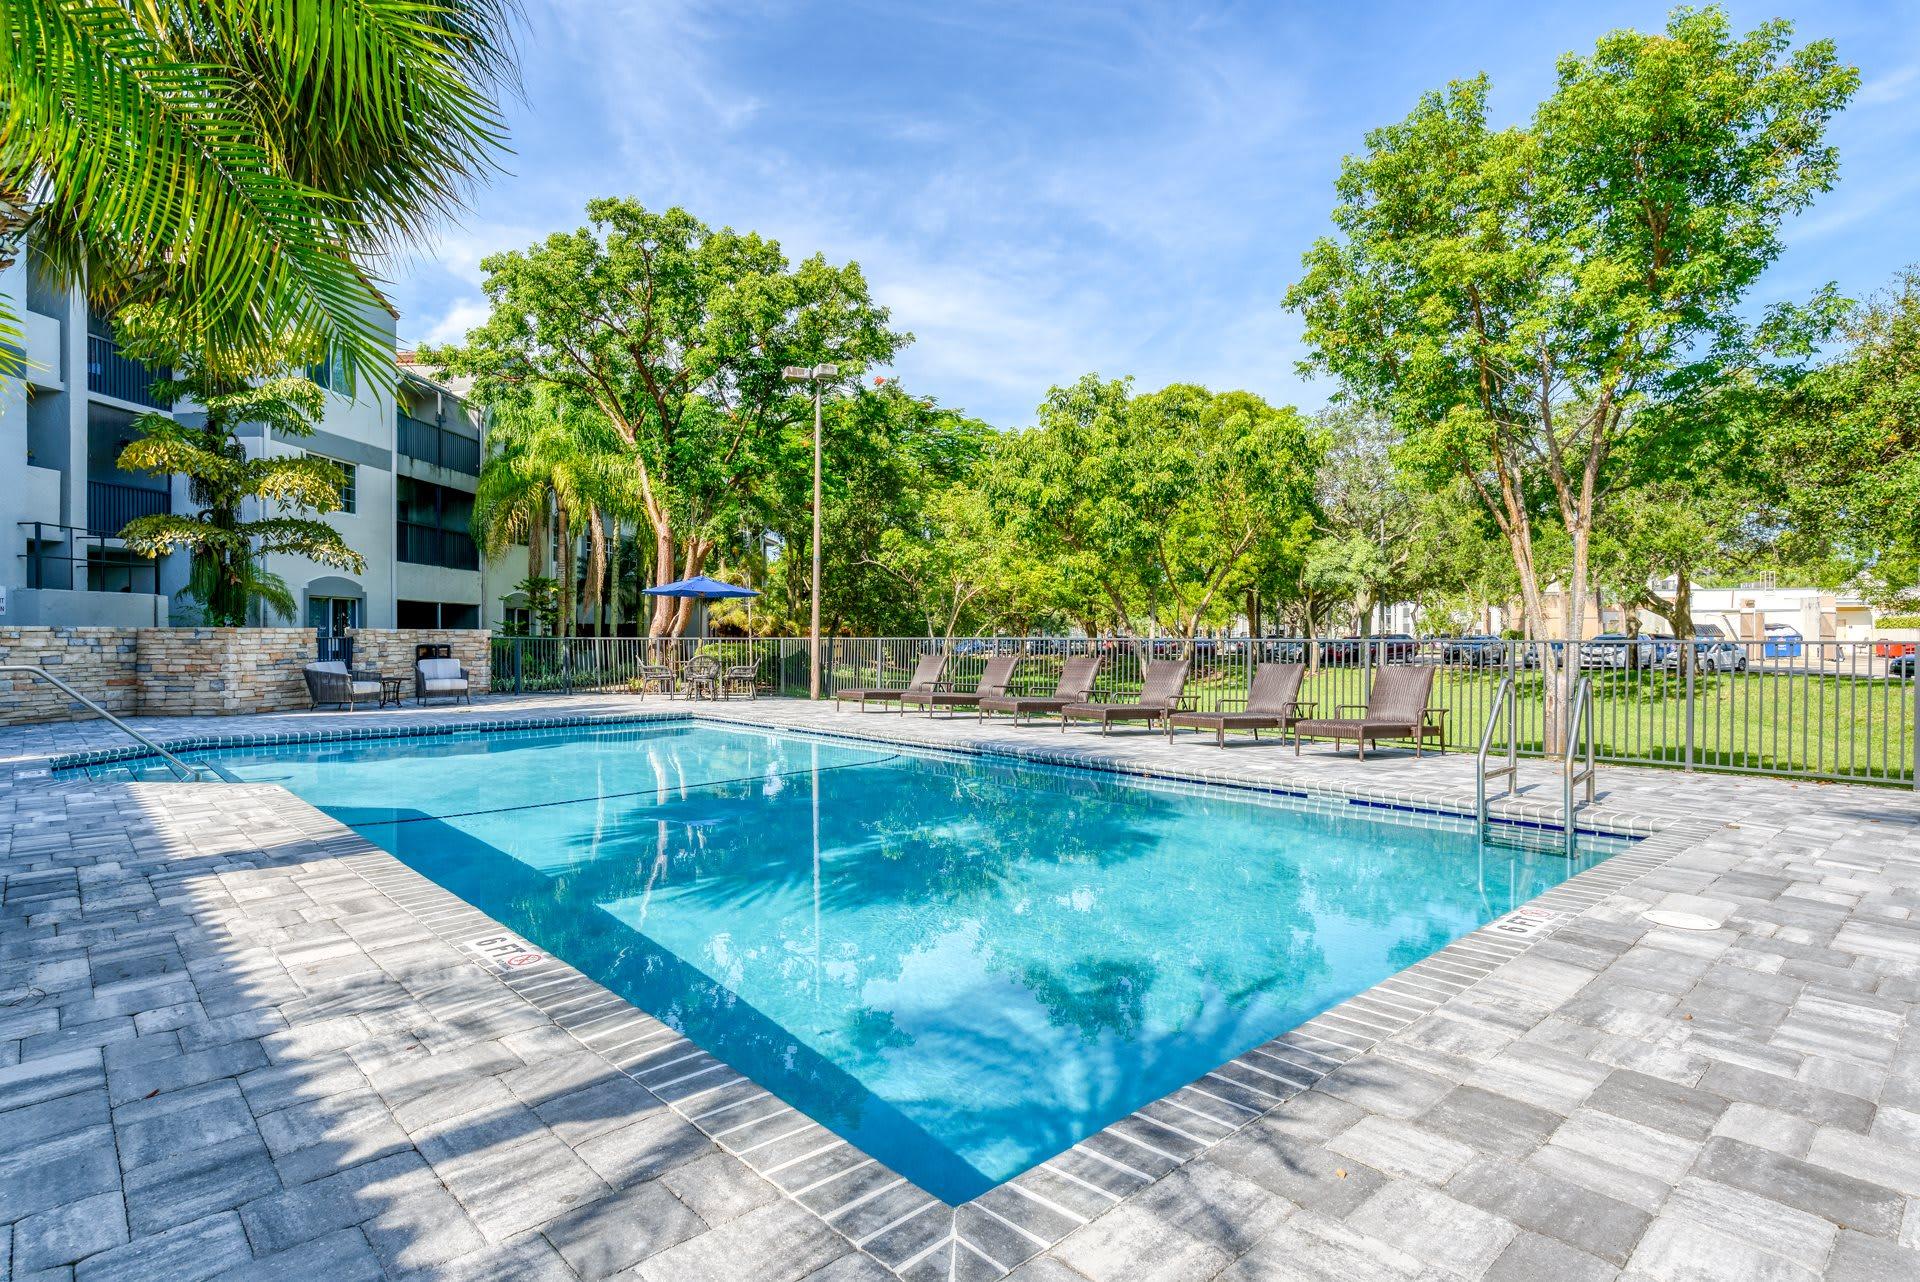 Pacifica Senior Living Sunrise Swimming Pool